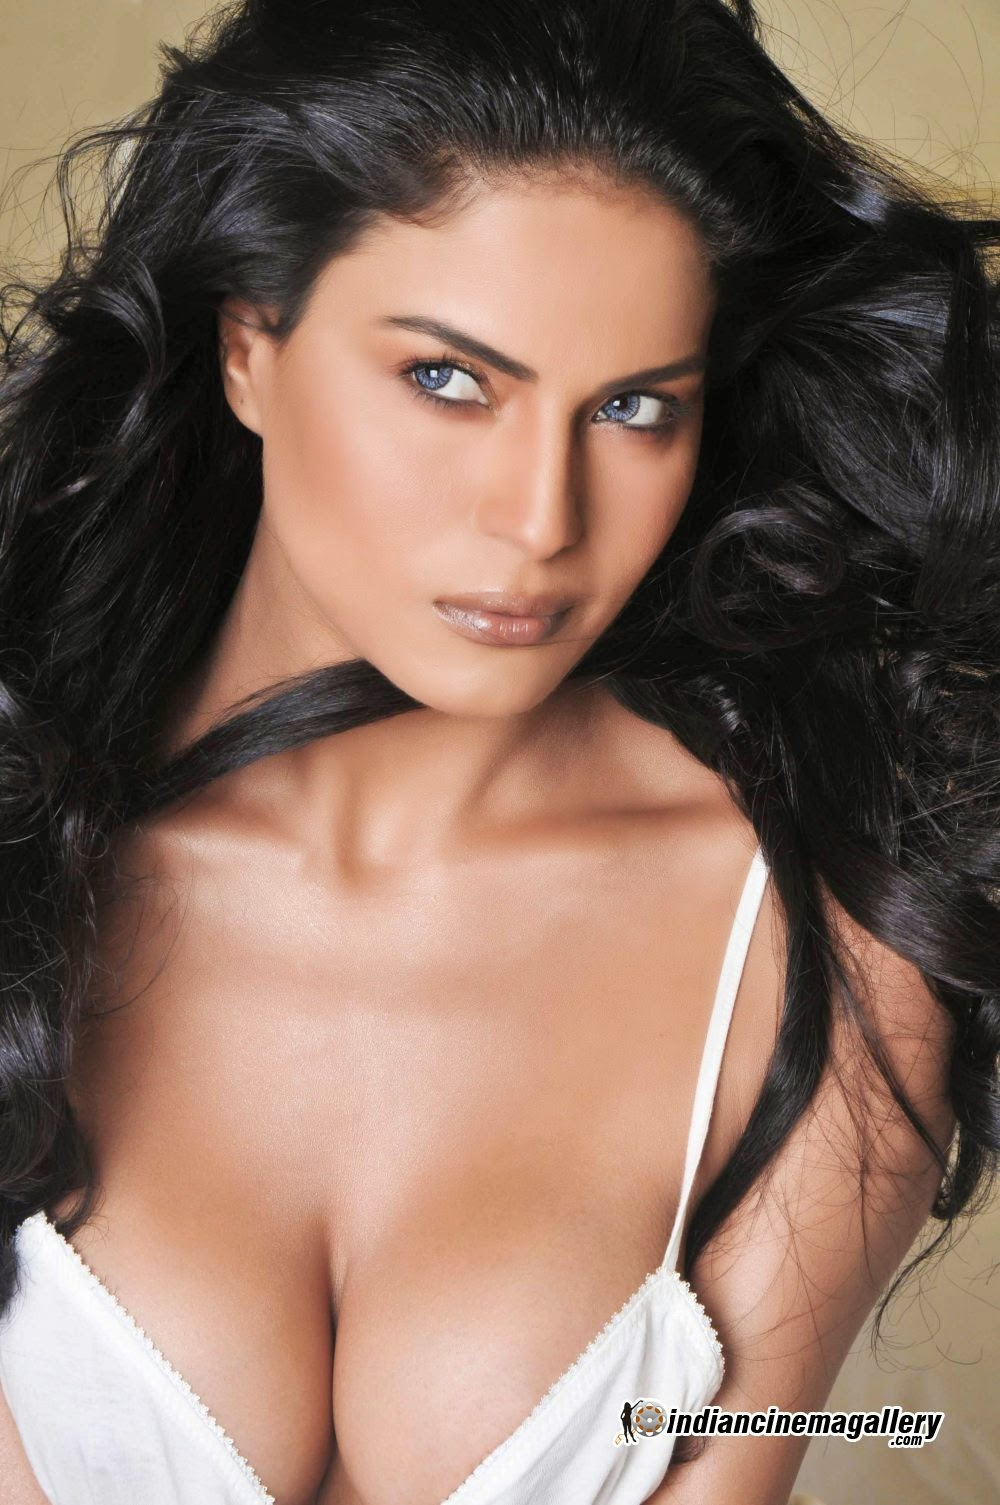 Hindi Mein Sexy Film Blue